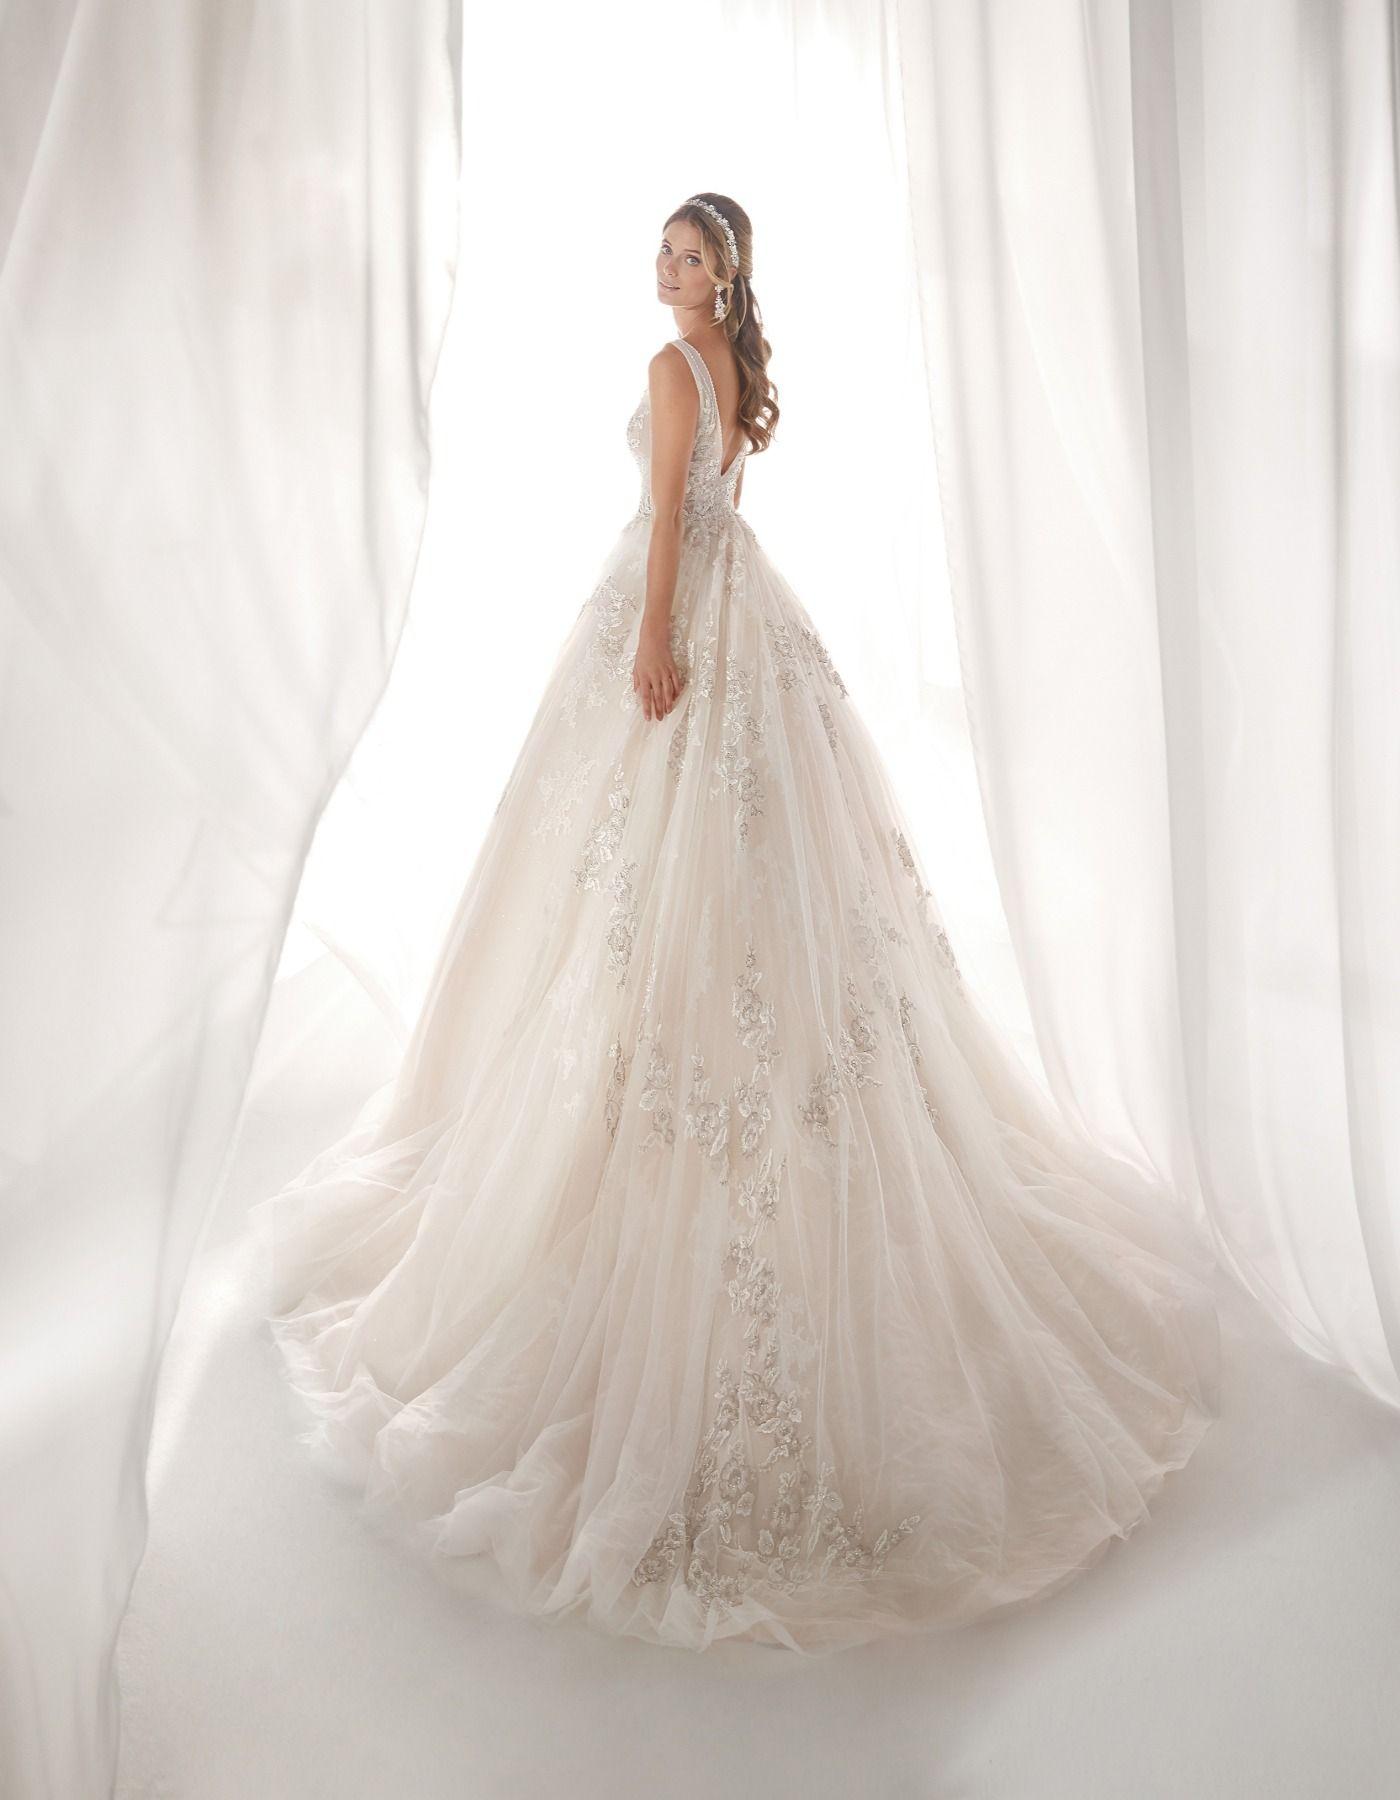 7f1430fb45d1 19015 by Nicole Spose  RaffaeleCiuca  NicoleSpose  WeddingDress  Bride